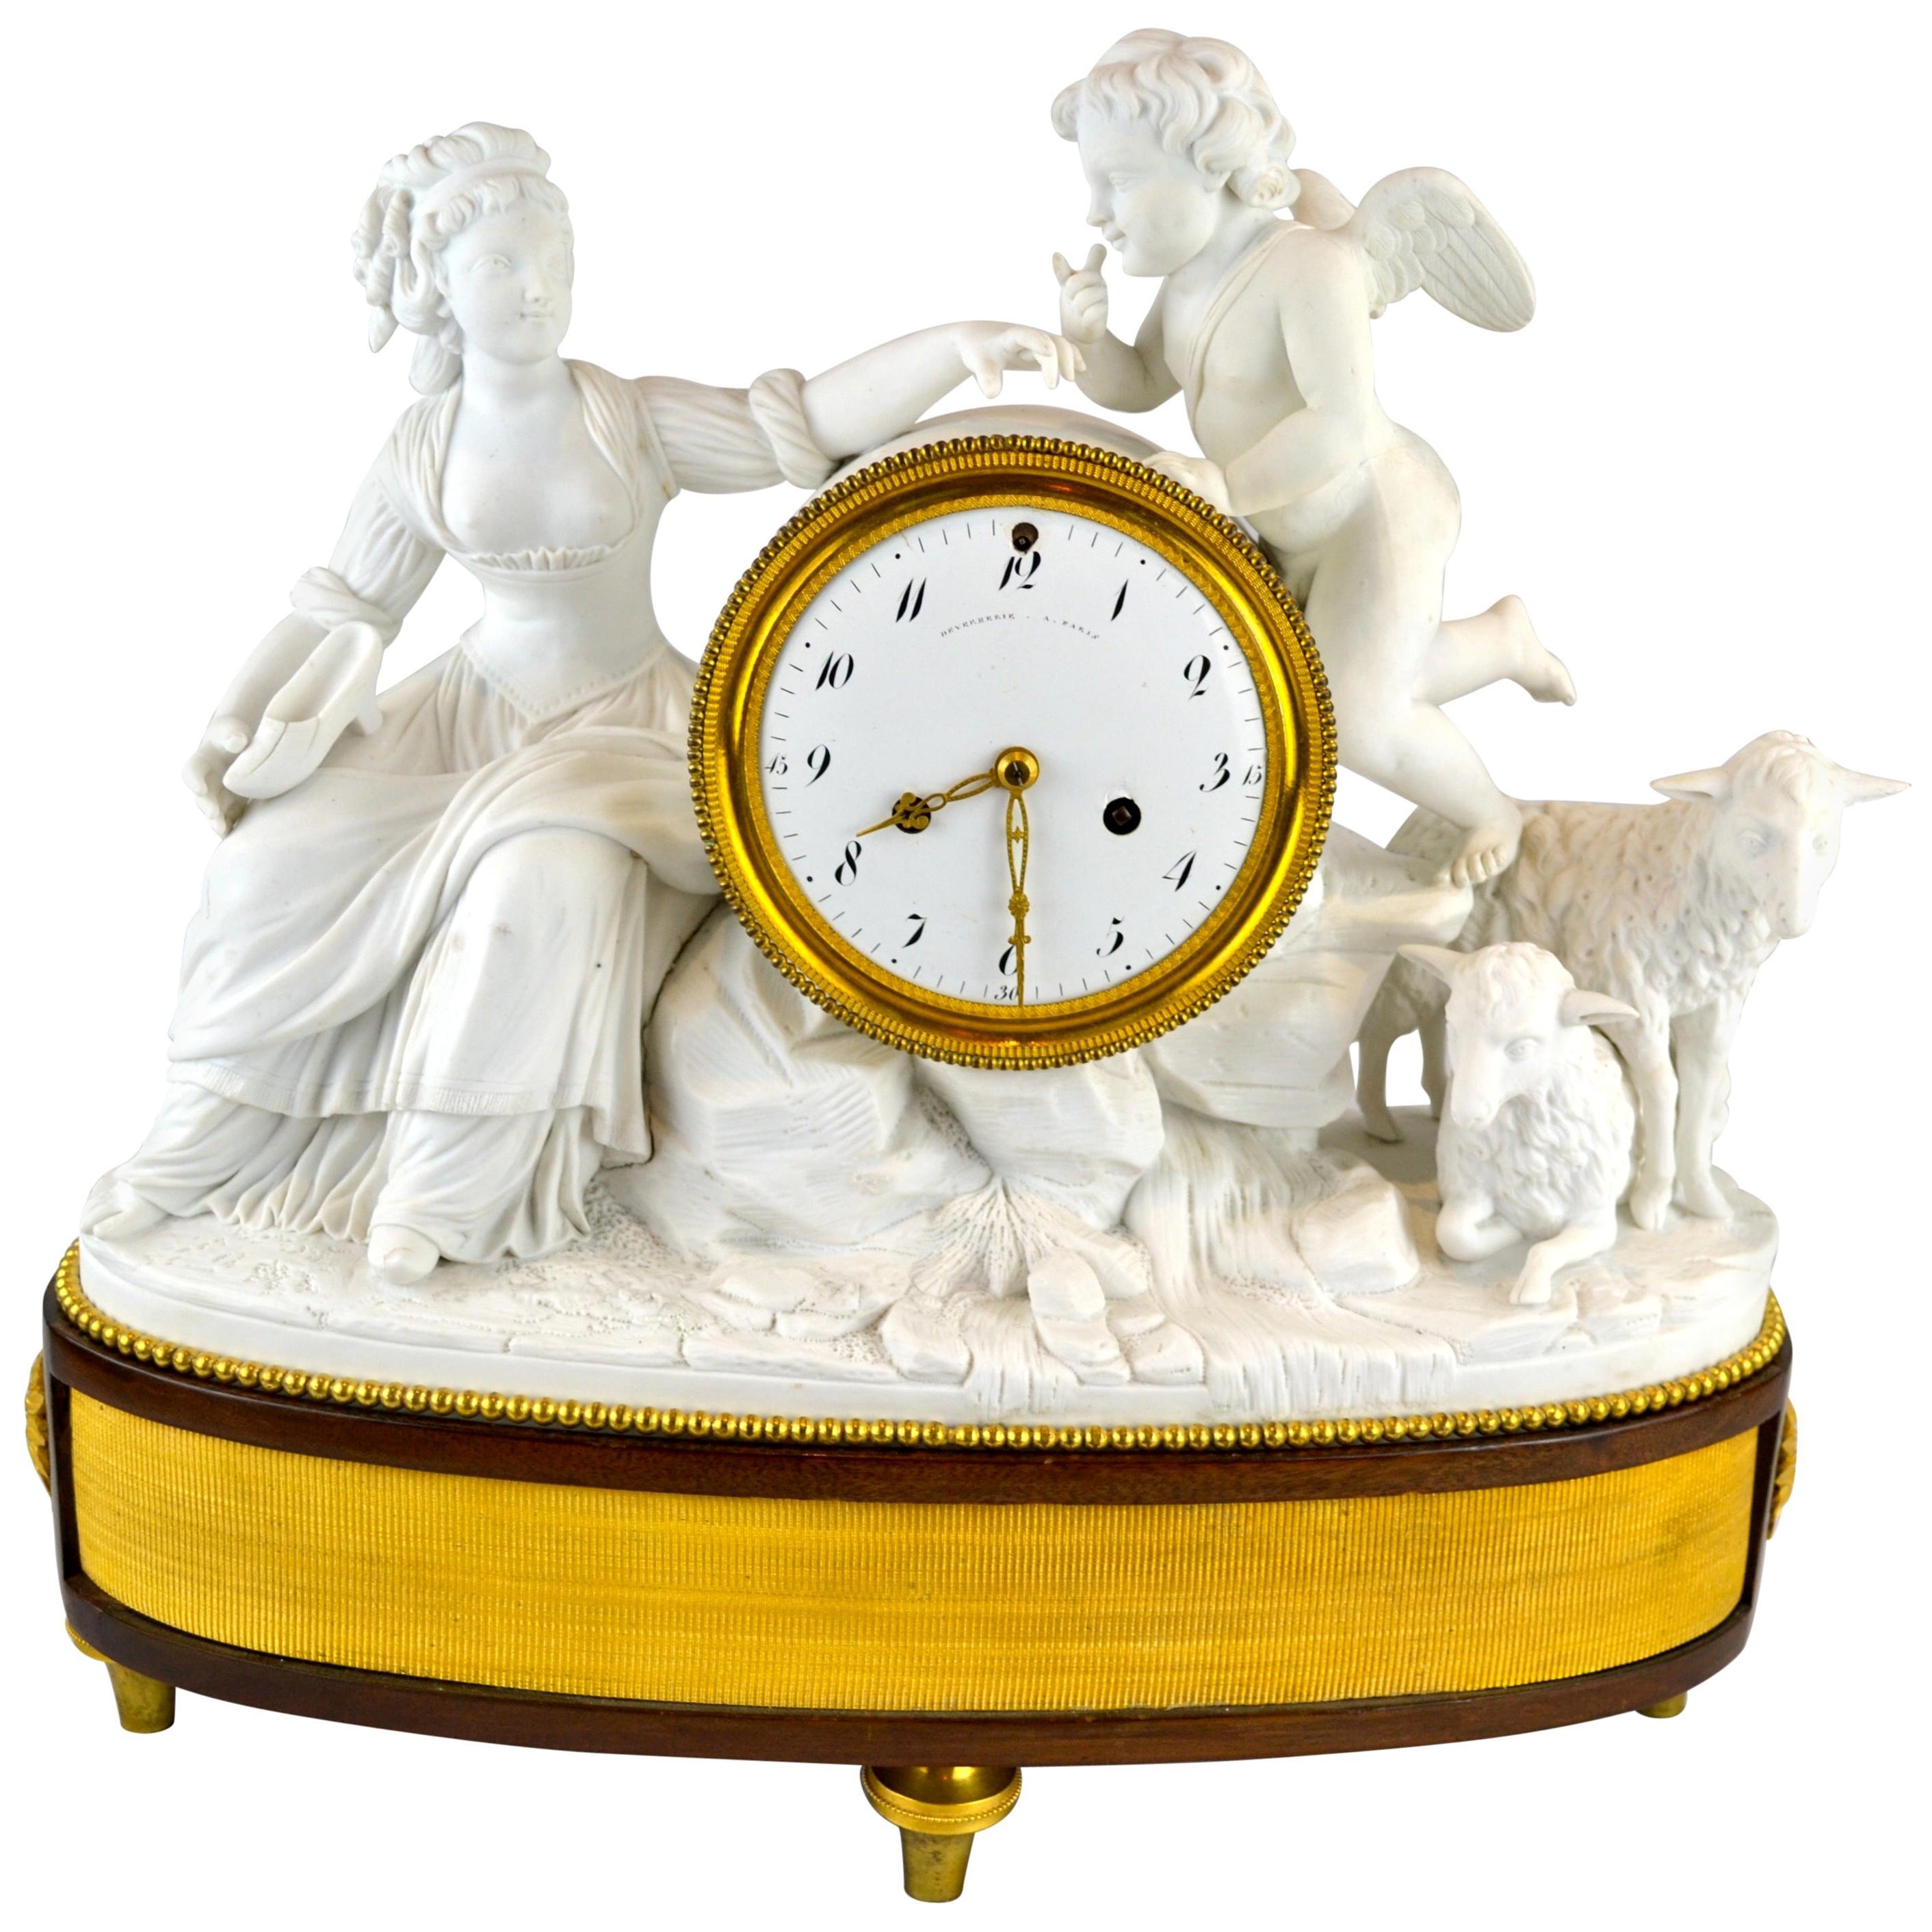 18th Century Louis XVI Period Figurative Bisque Clock